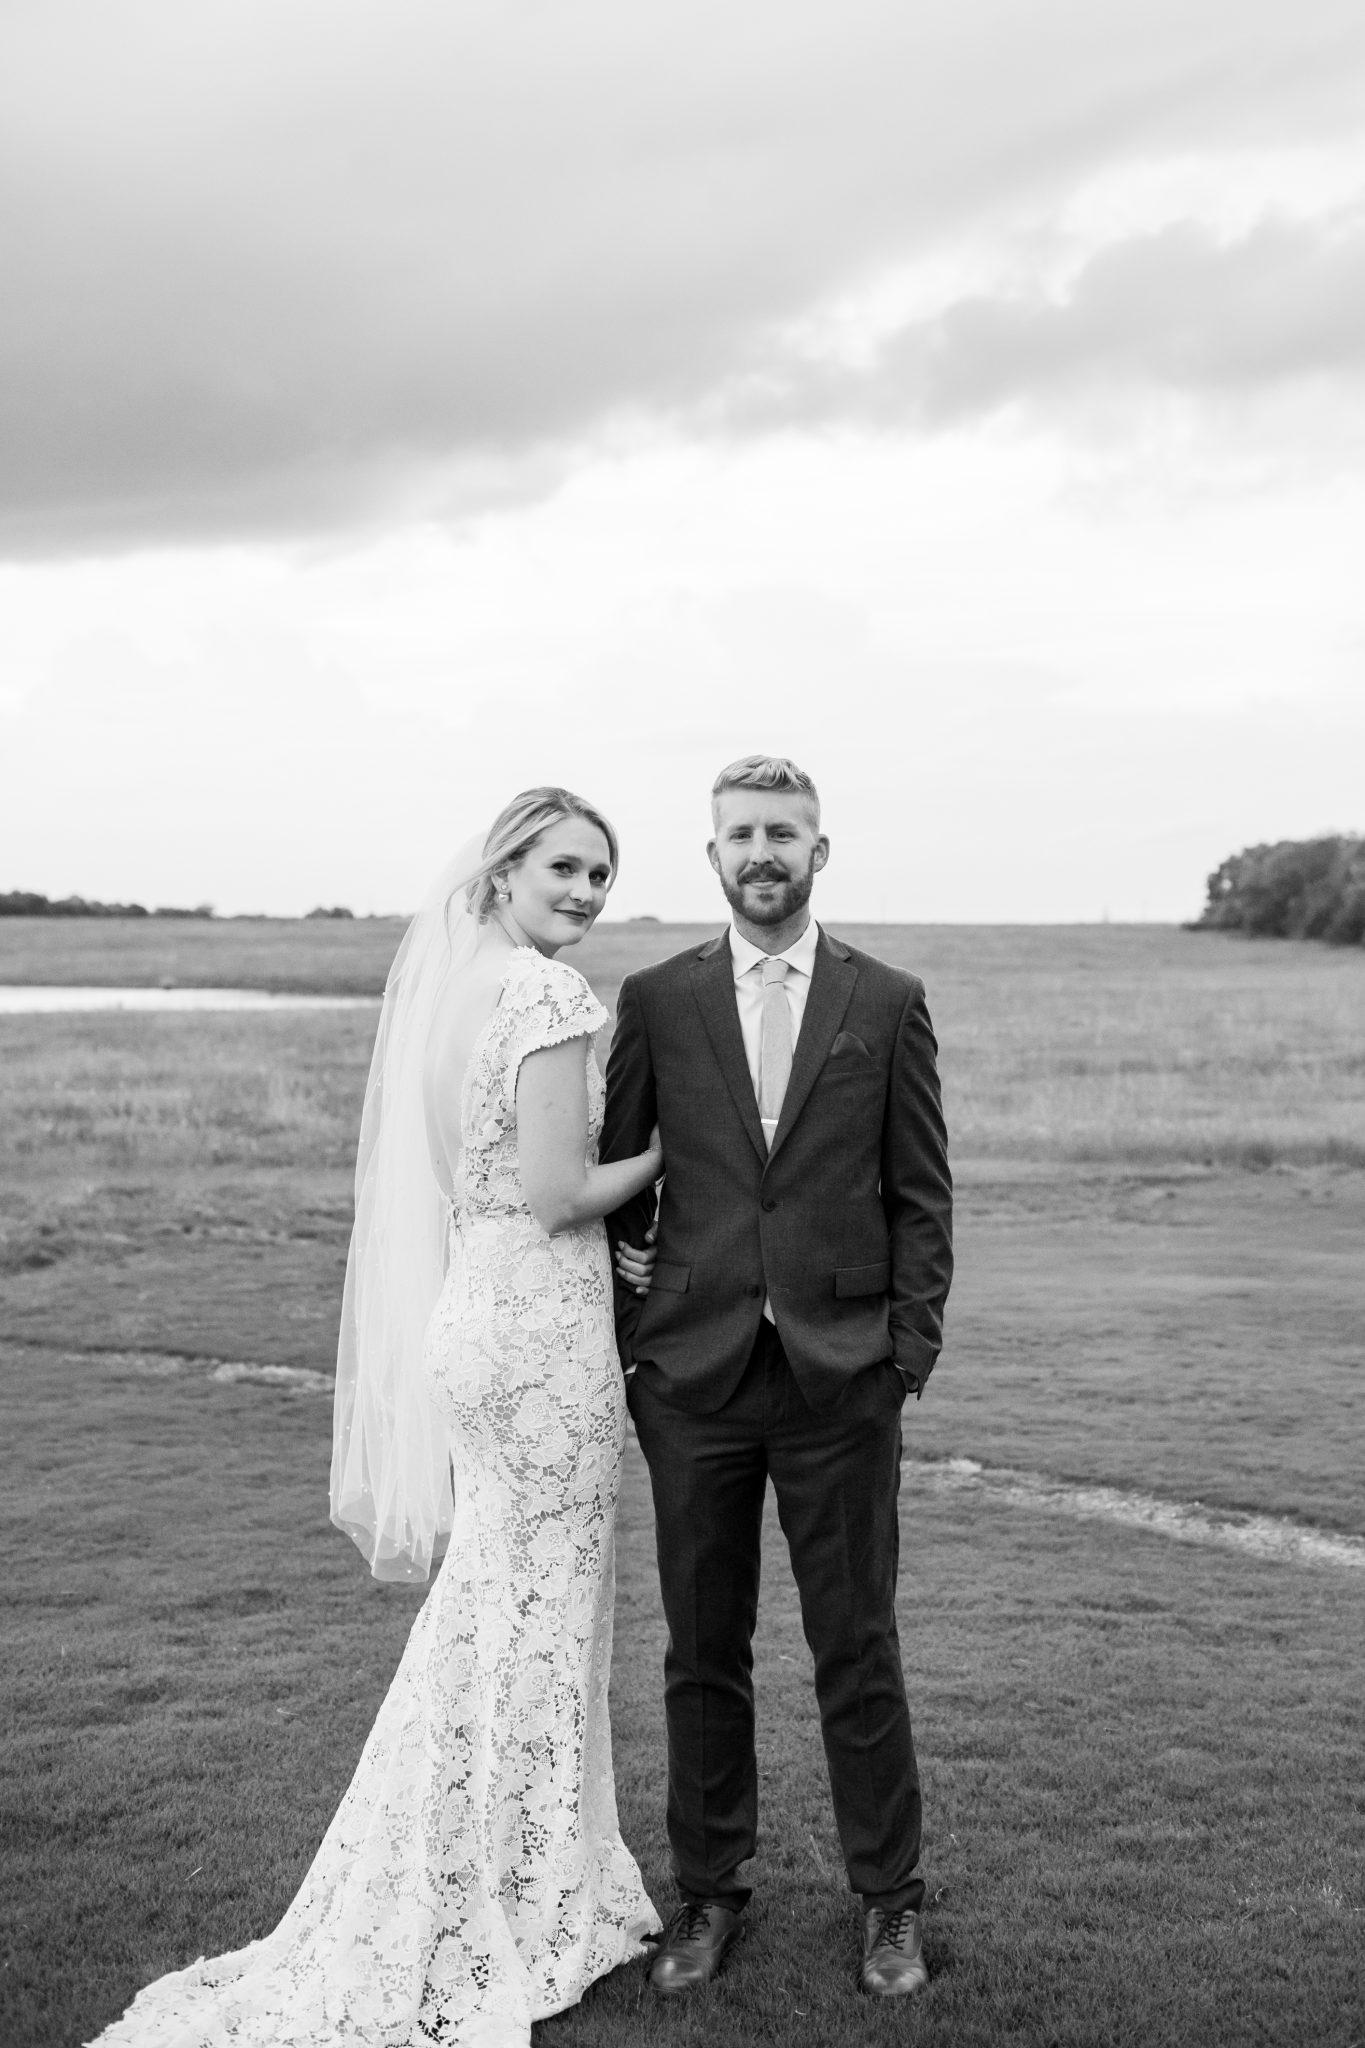 Bishop-Intimate-Ceremony-Wichita-Wedding-25